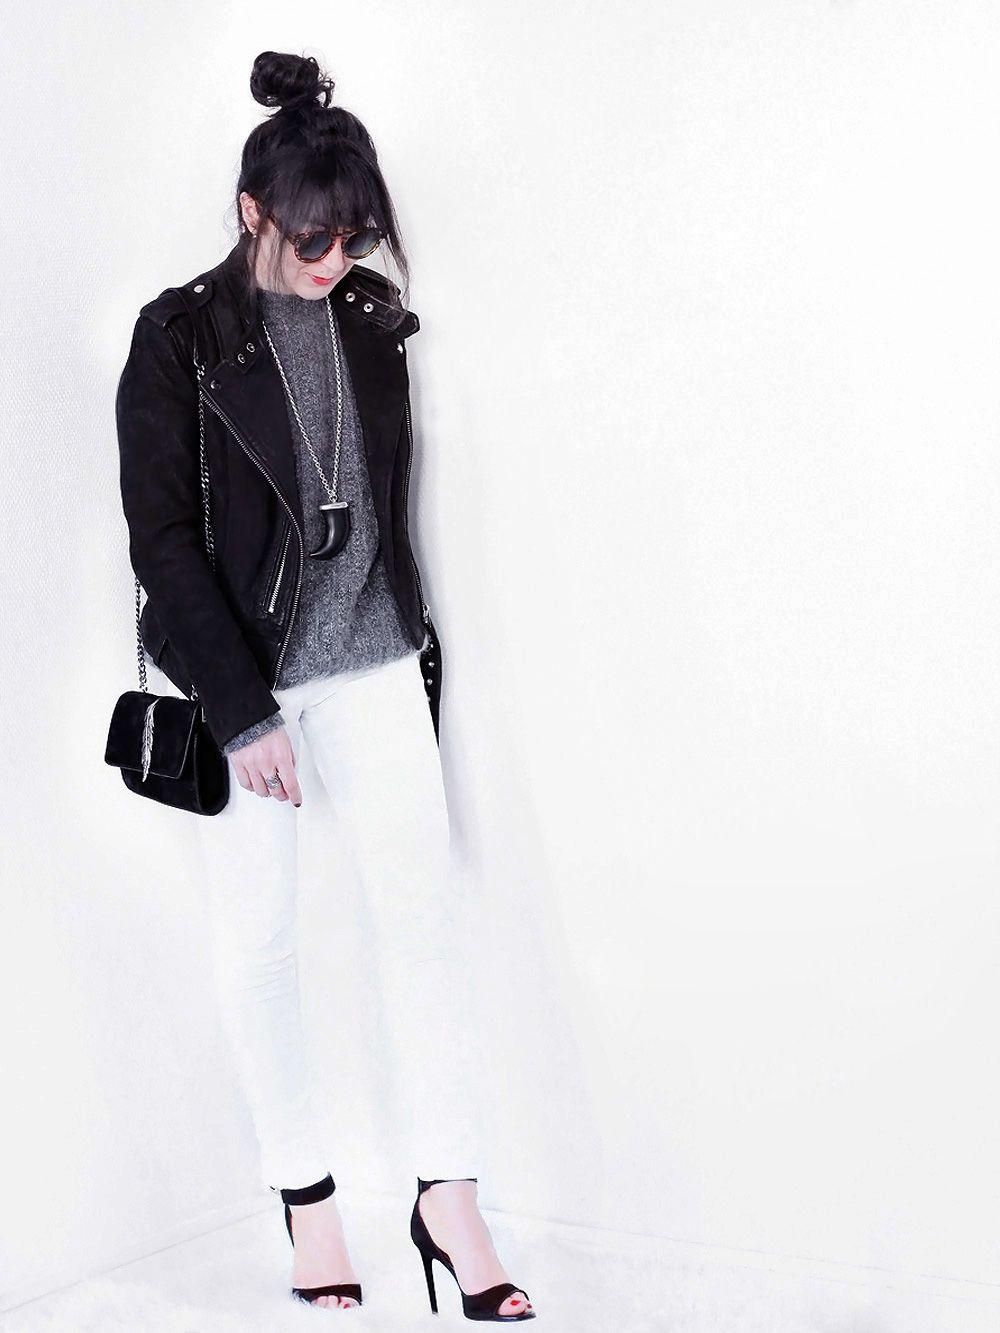 Perfecto Plume Denim Sac Sandales Jean Blanc Givenchy Studio Iro Ybf7m6Igyv